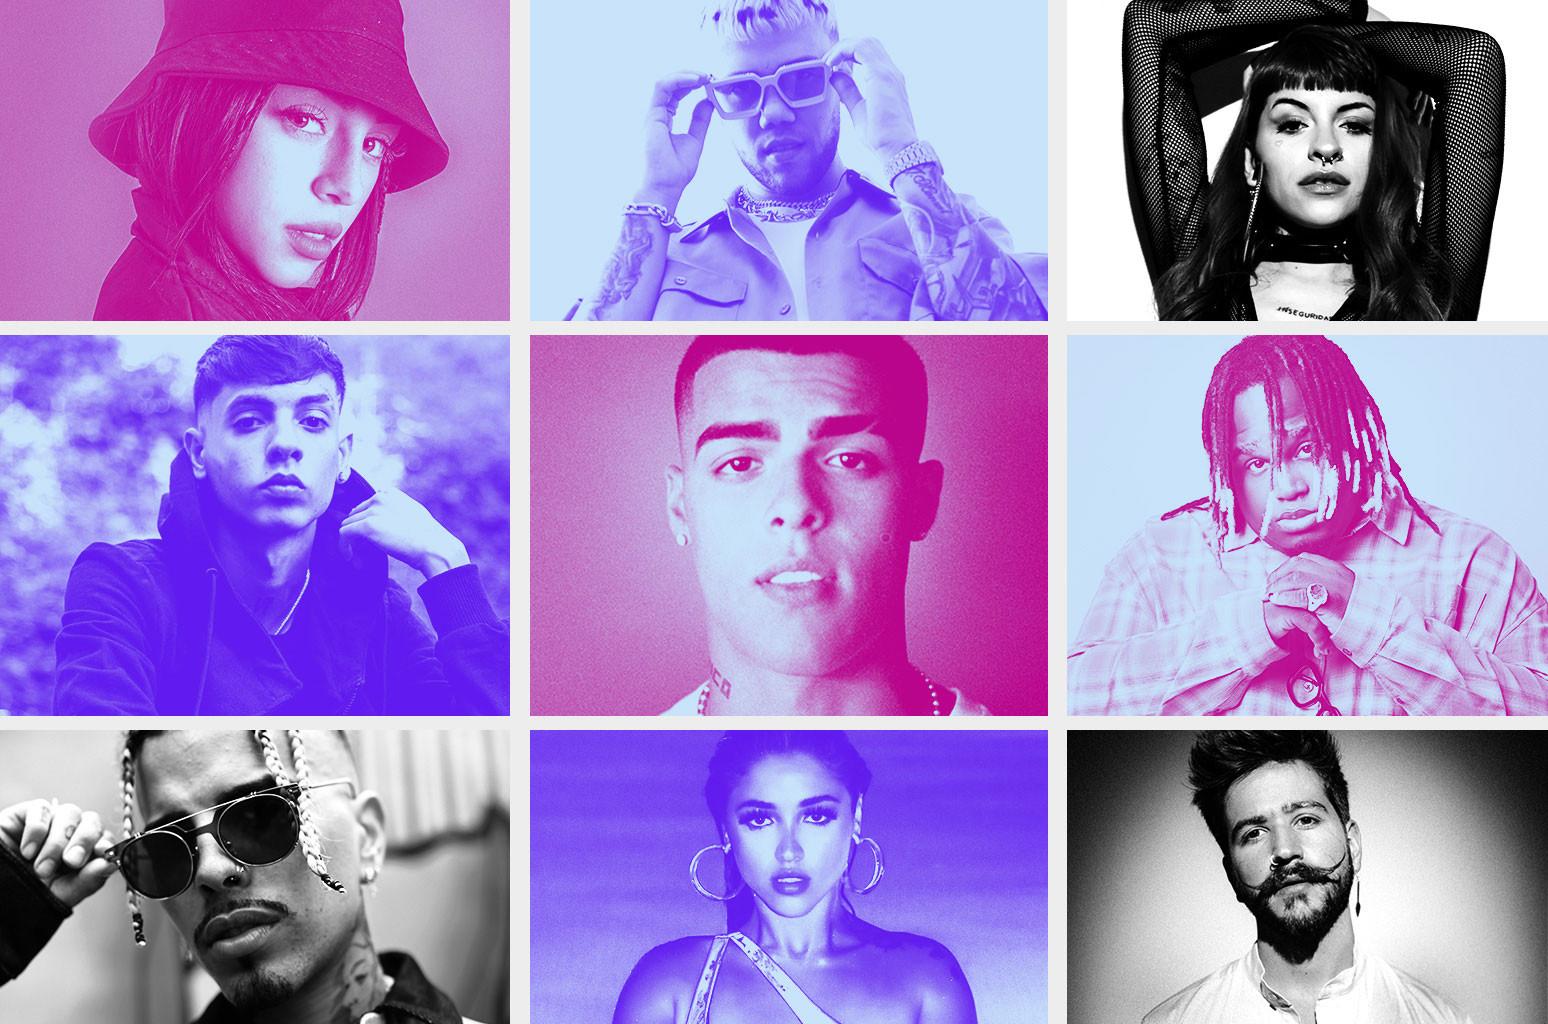 Nicki Nicole, Jhay Cortez, Cazzu, Natanael Cano, Lunay, Sech, Rauw Alejandro, Mariah Angeliq, Camilo.